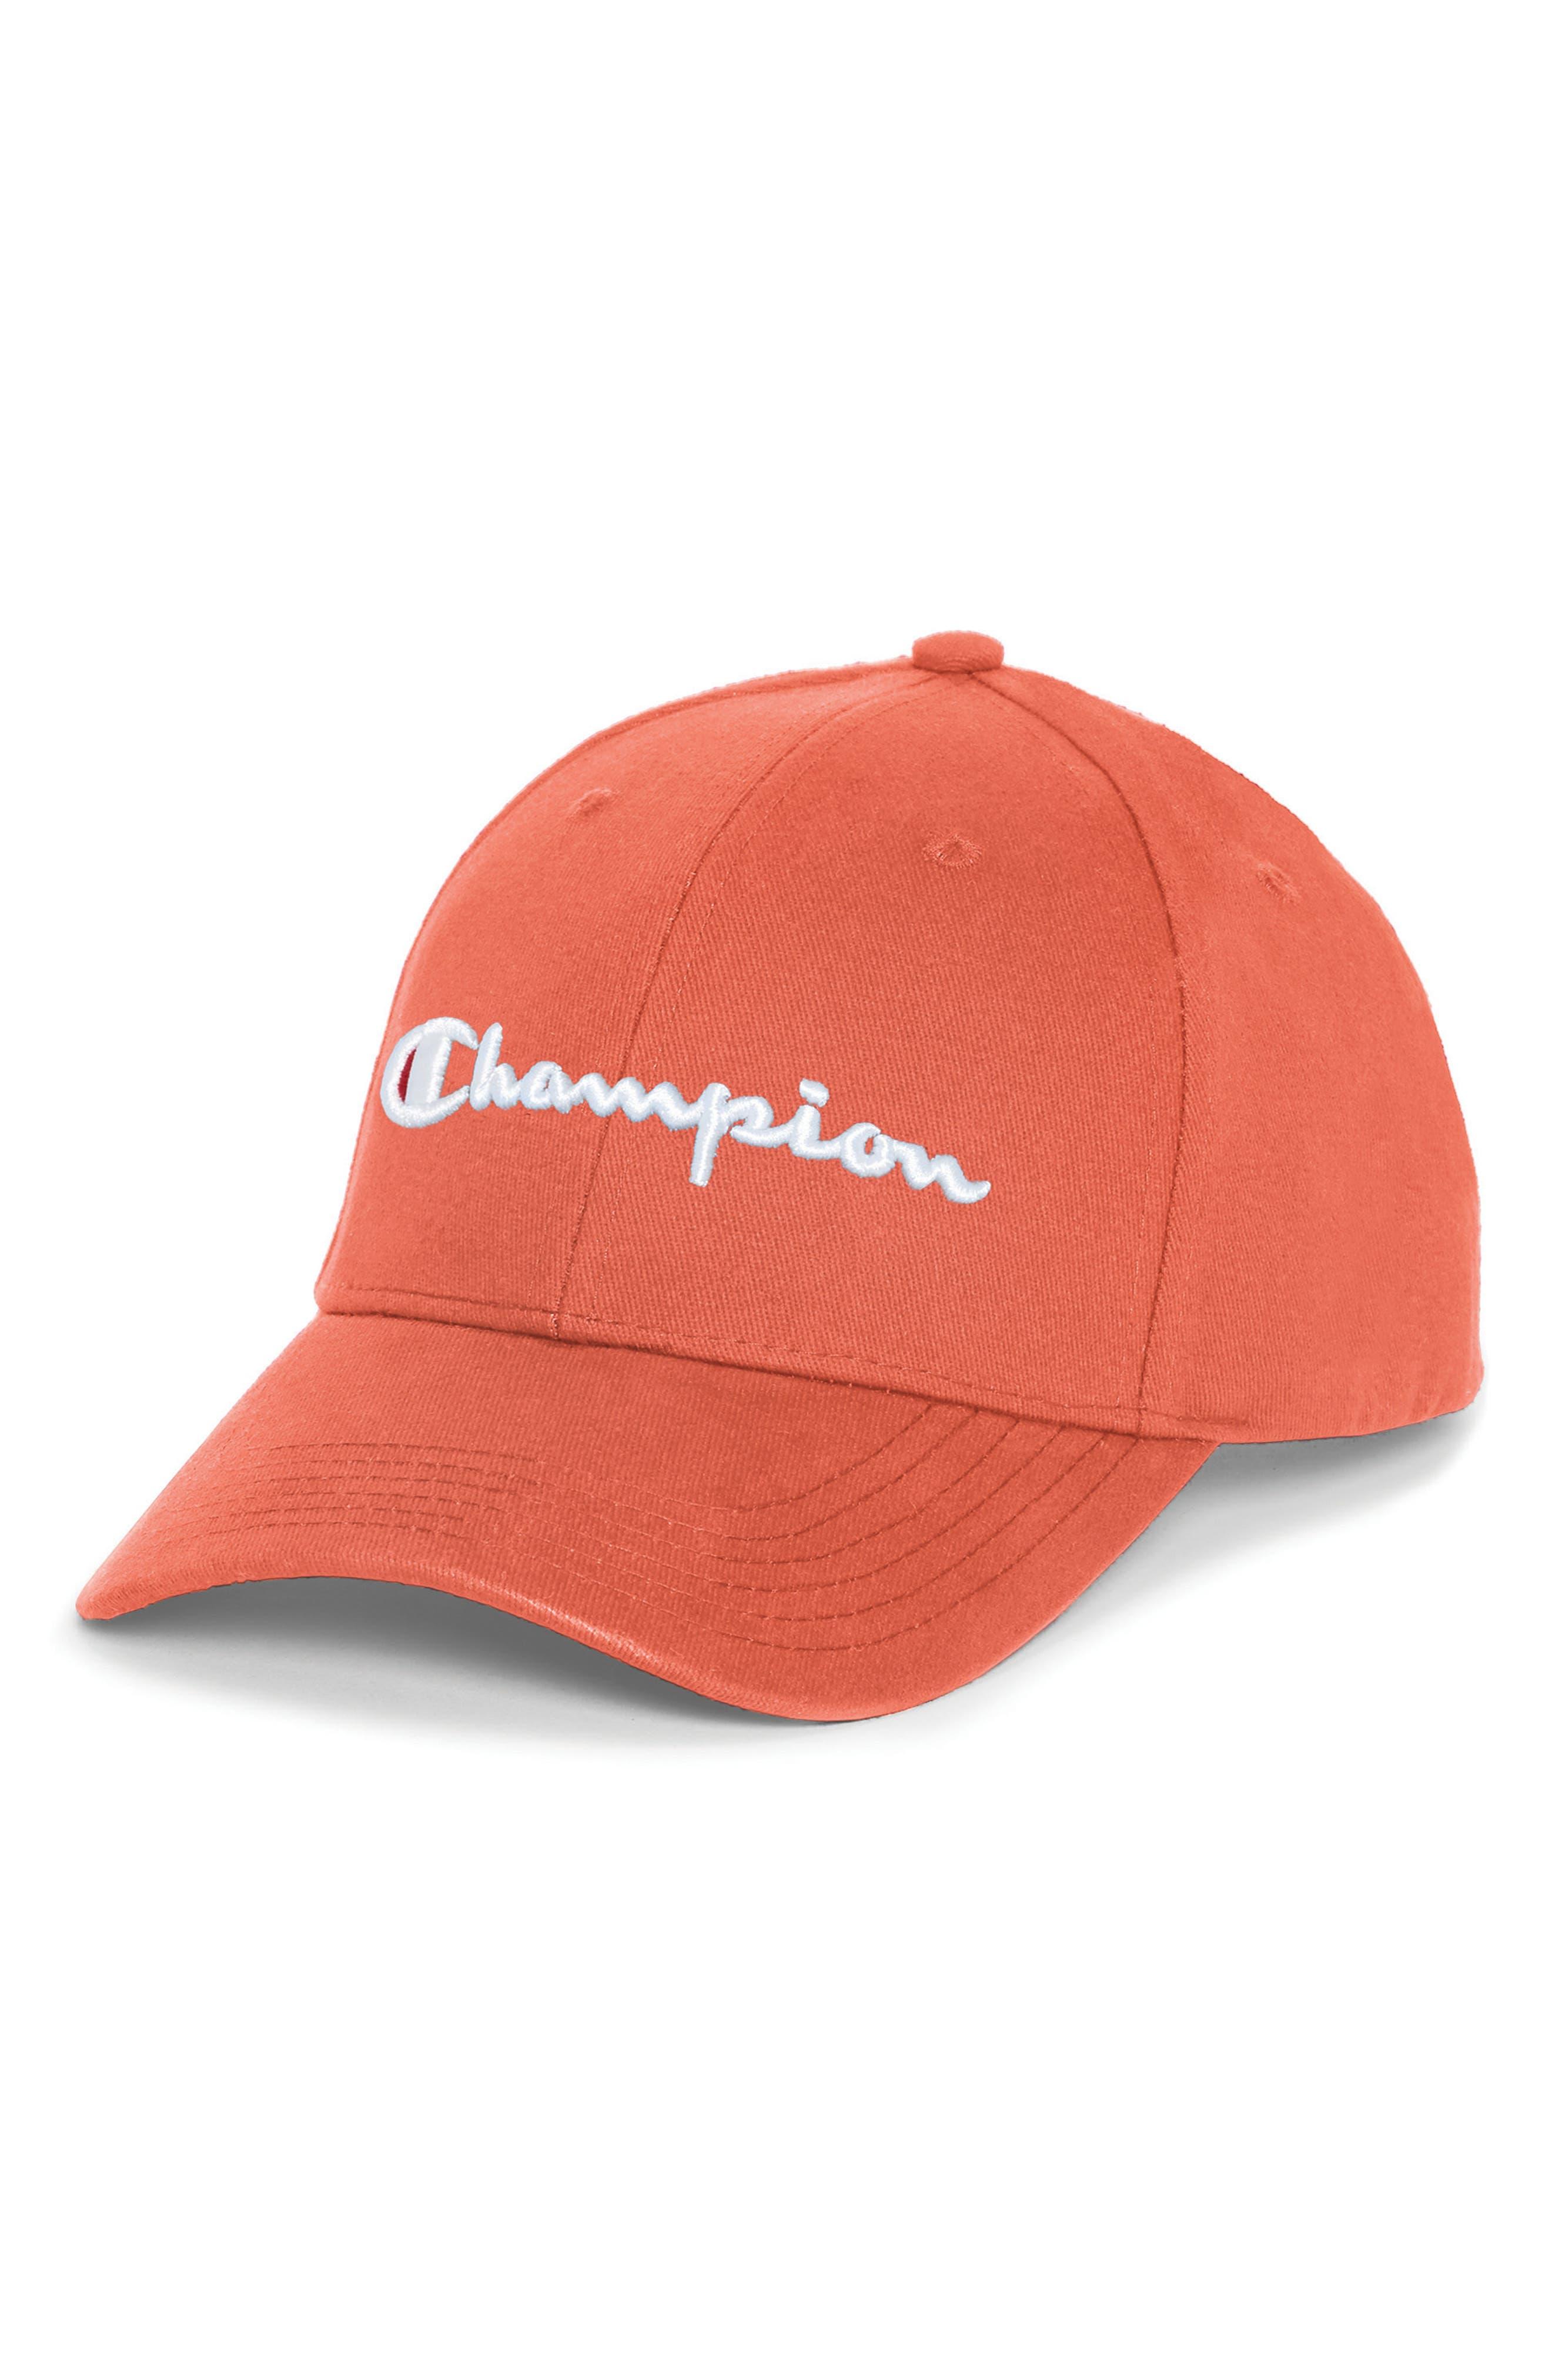 ed9f45f7c89ef Champion Baseball Hats for Men   Dad Hats